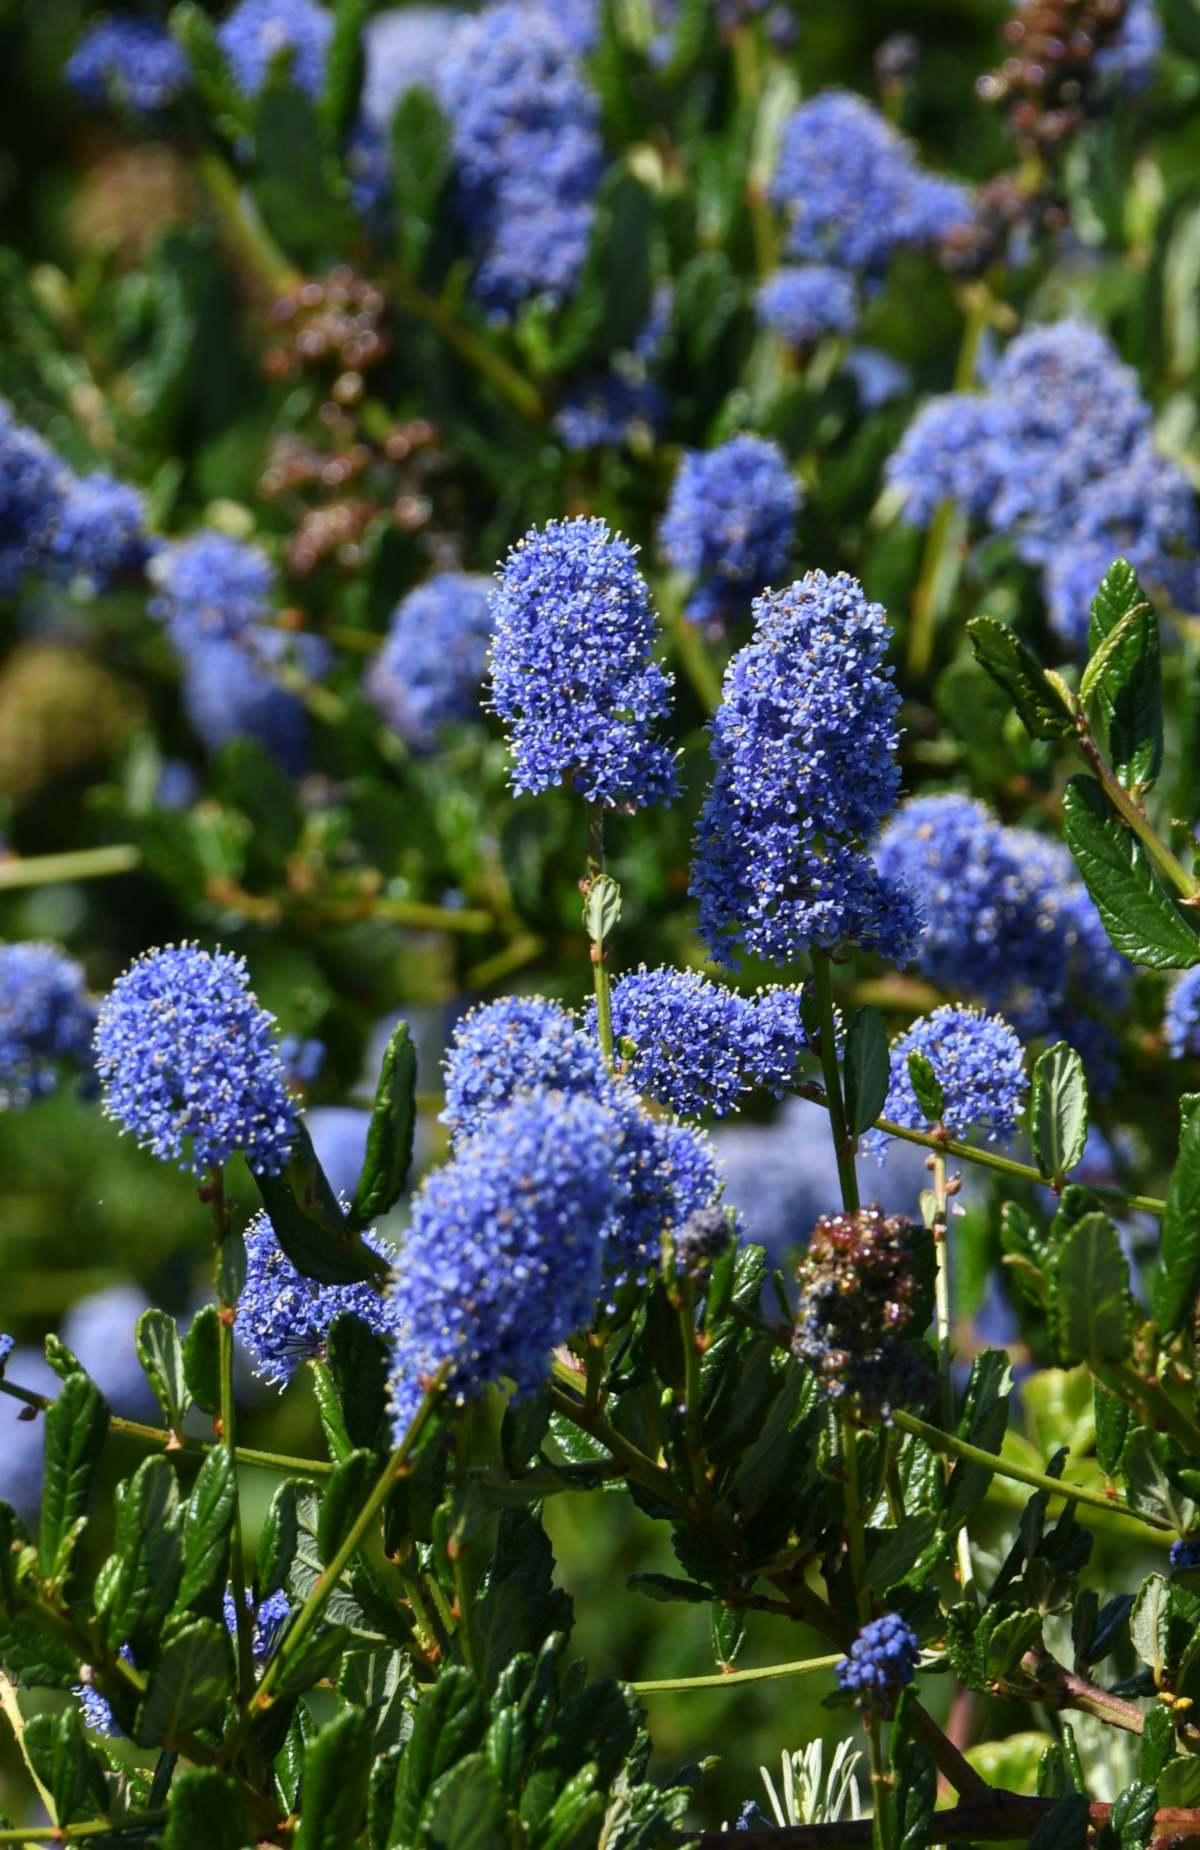 Blue flowers of the soap bush shrub